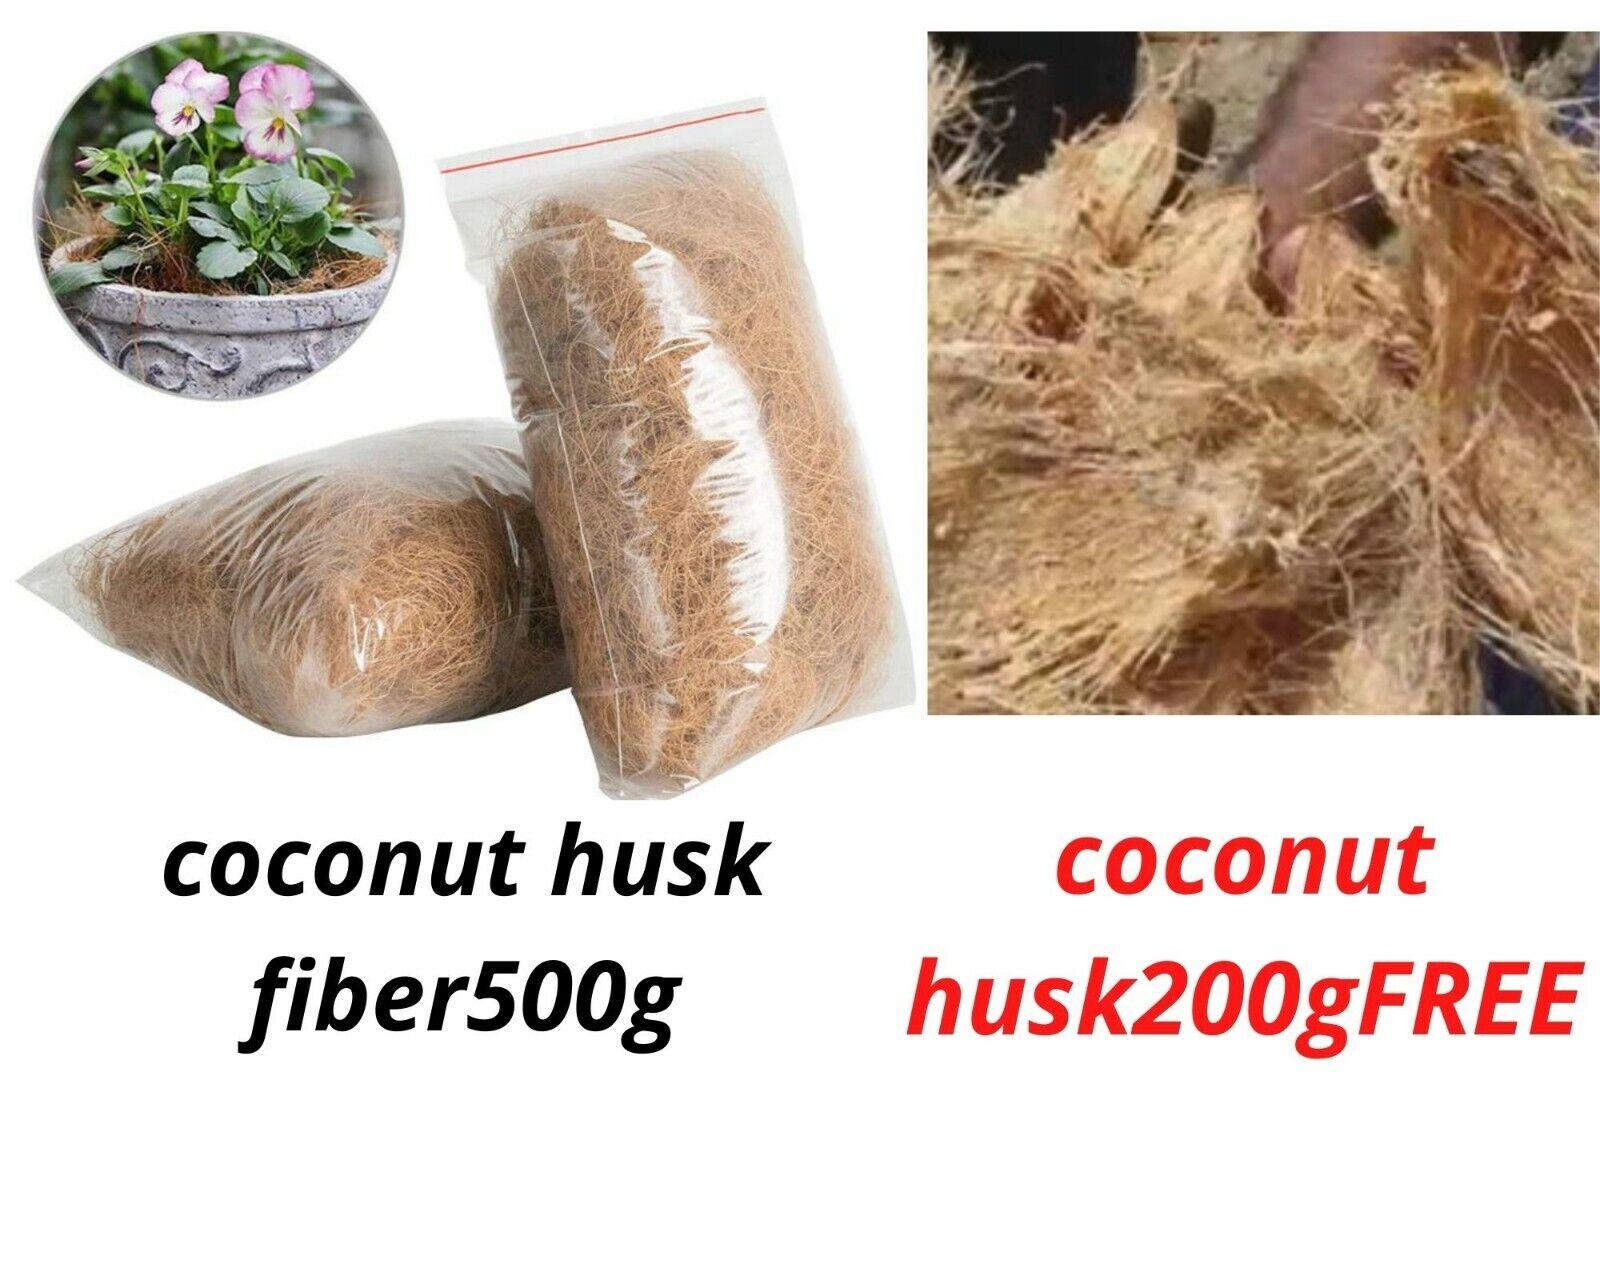 100% Natural Homemade Eco-Friendly Ceylon Coconut Husk Fiber Pure Organic Brand